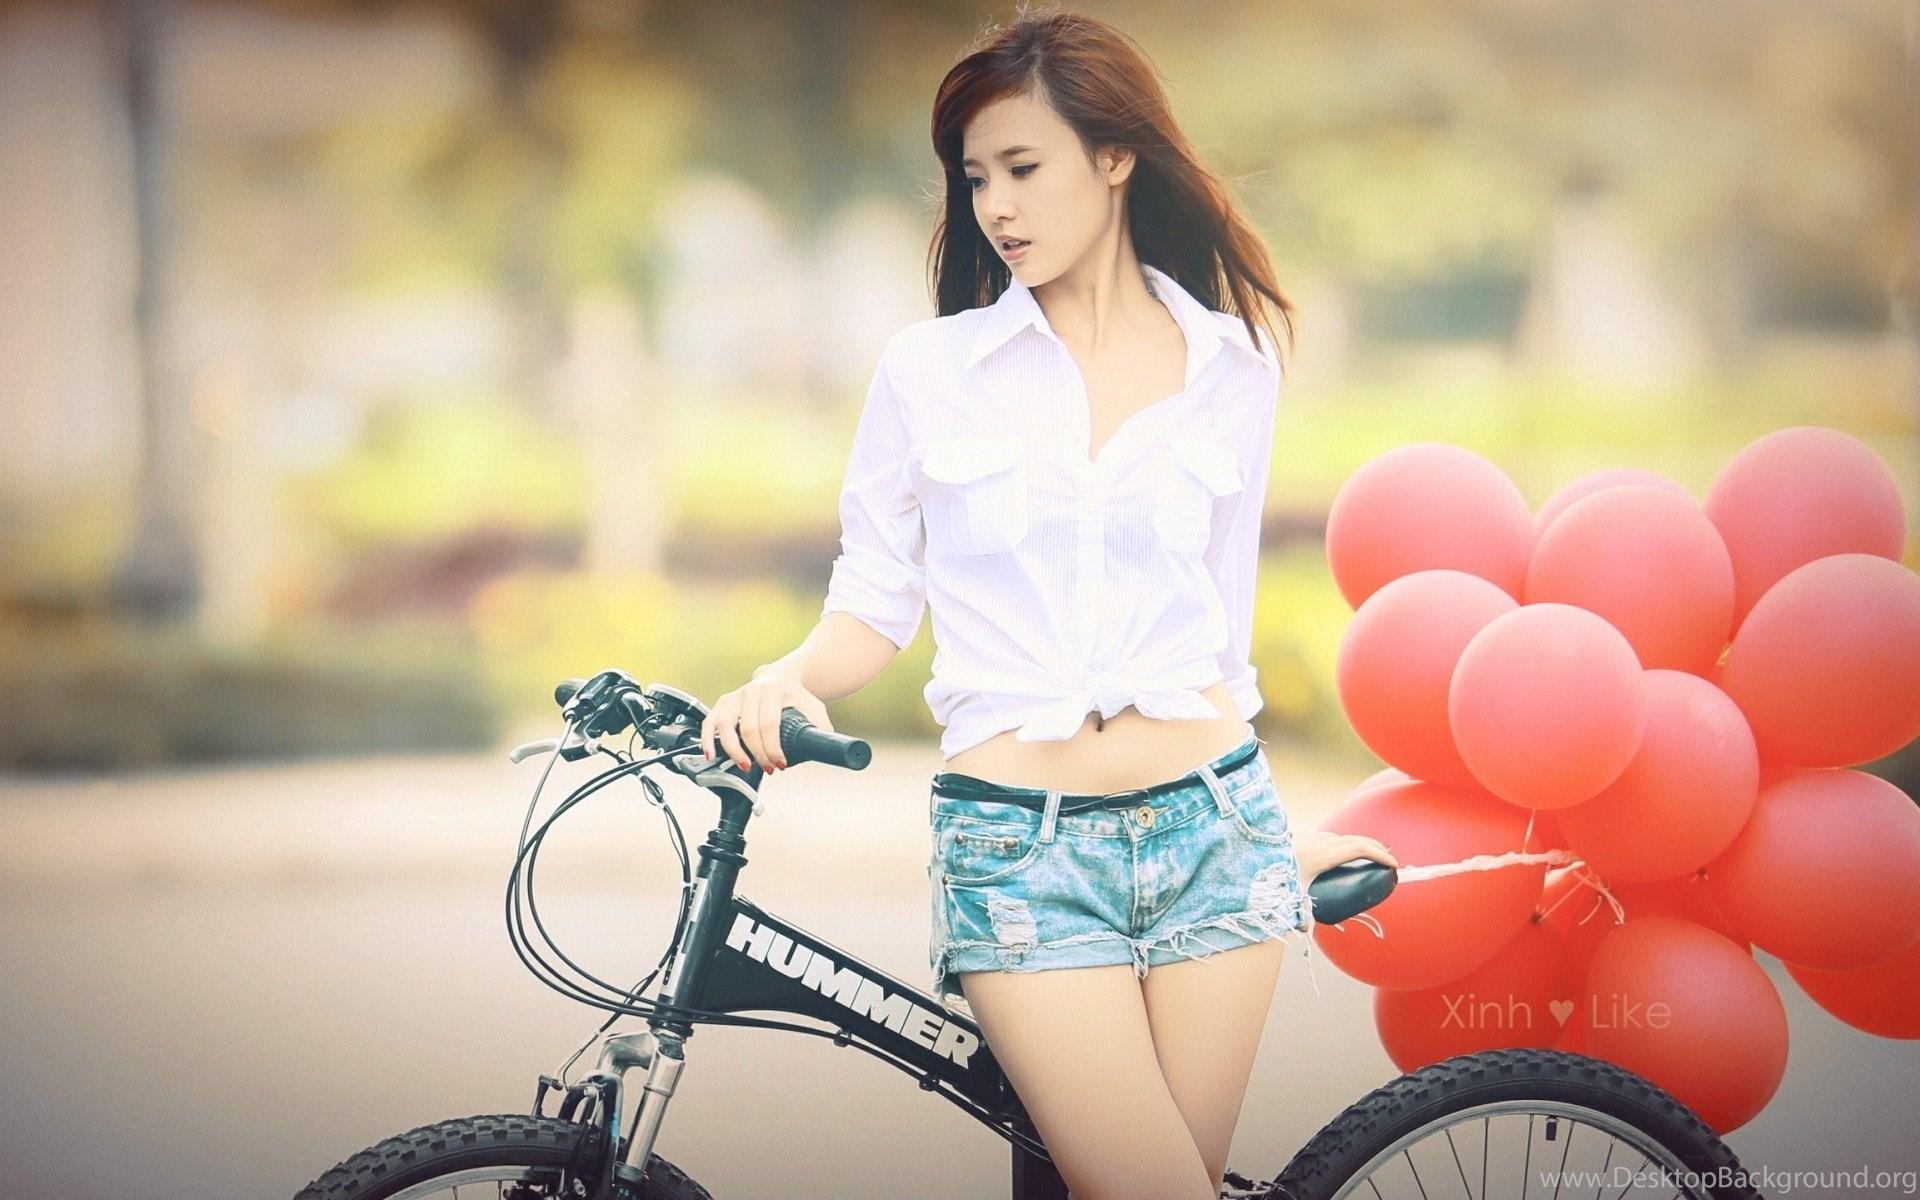 Hd korean girl wallpapers wallpapers asian girl bike red balloons beauty girl hd desktop wallpapers voltagebd Images